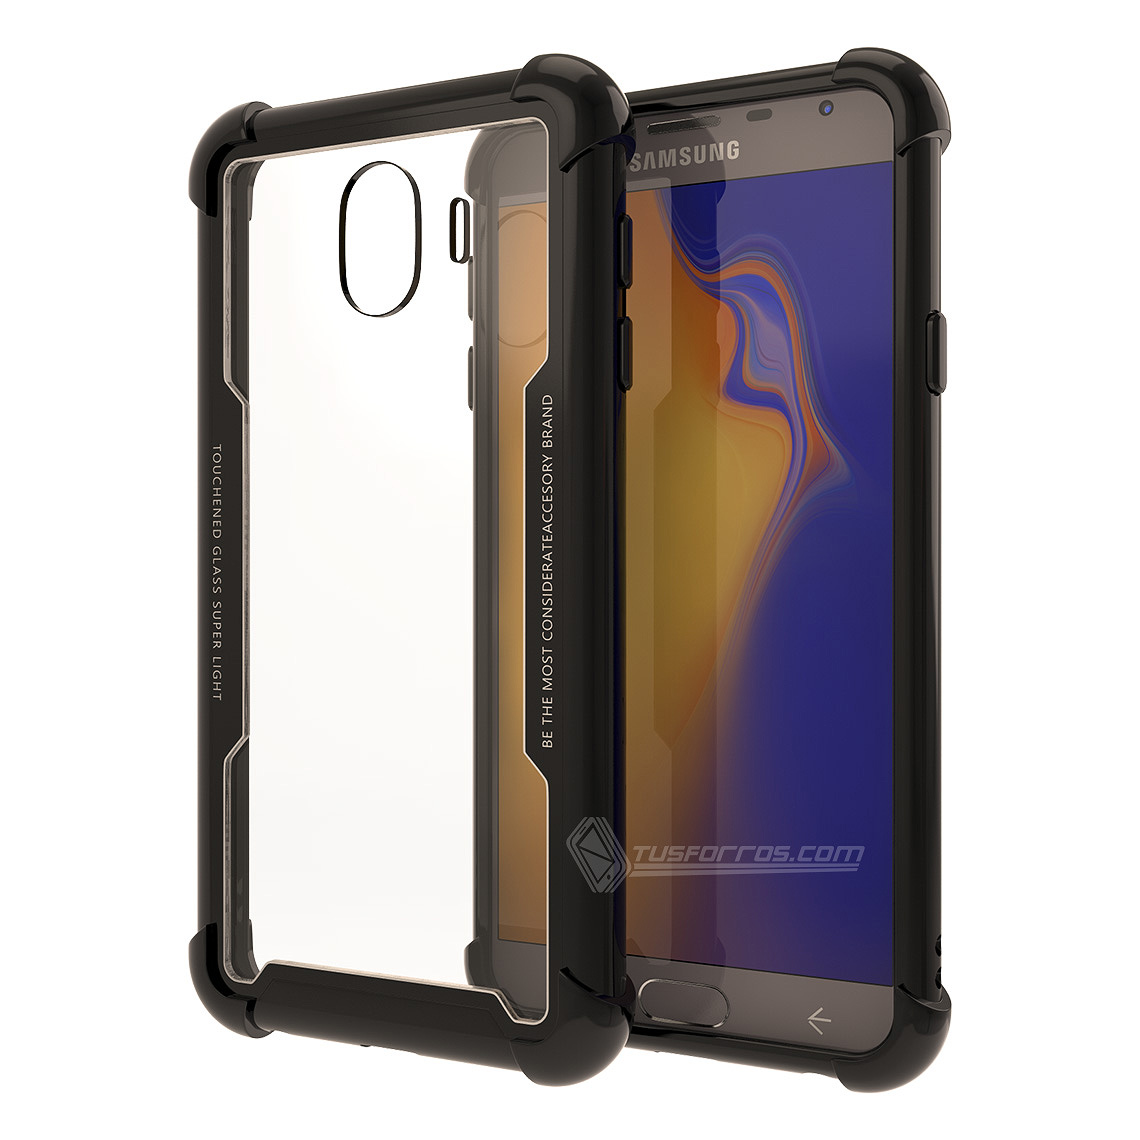 Samsung Galaxy J4 2018 Forro Anti-Shock Edge Black BackCover Cristal Clear